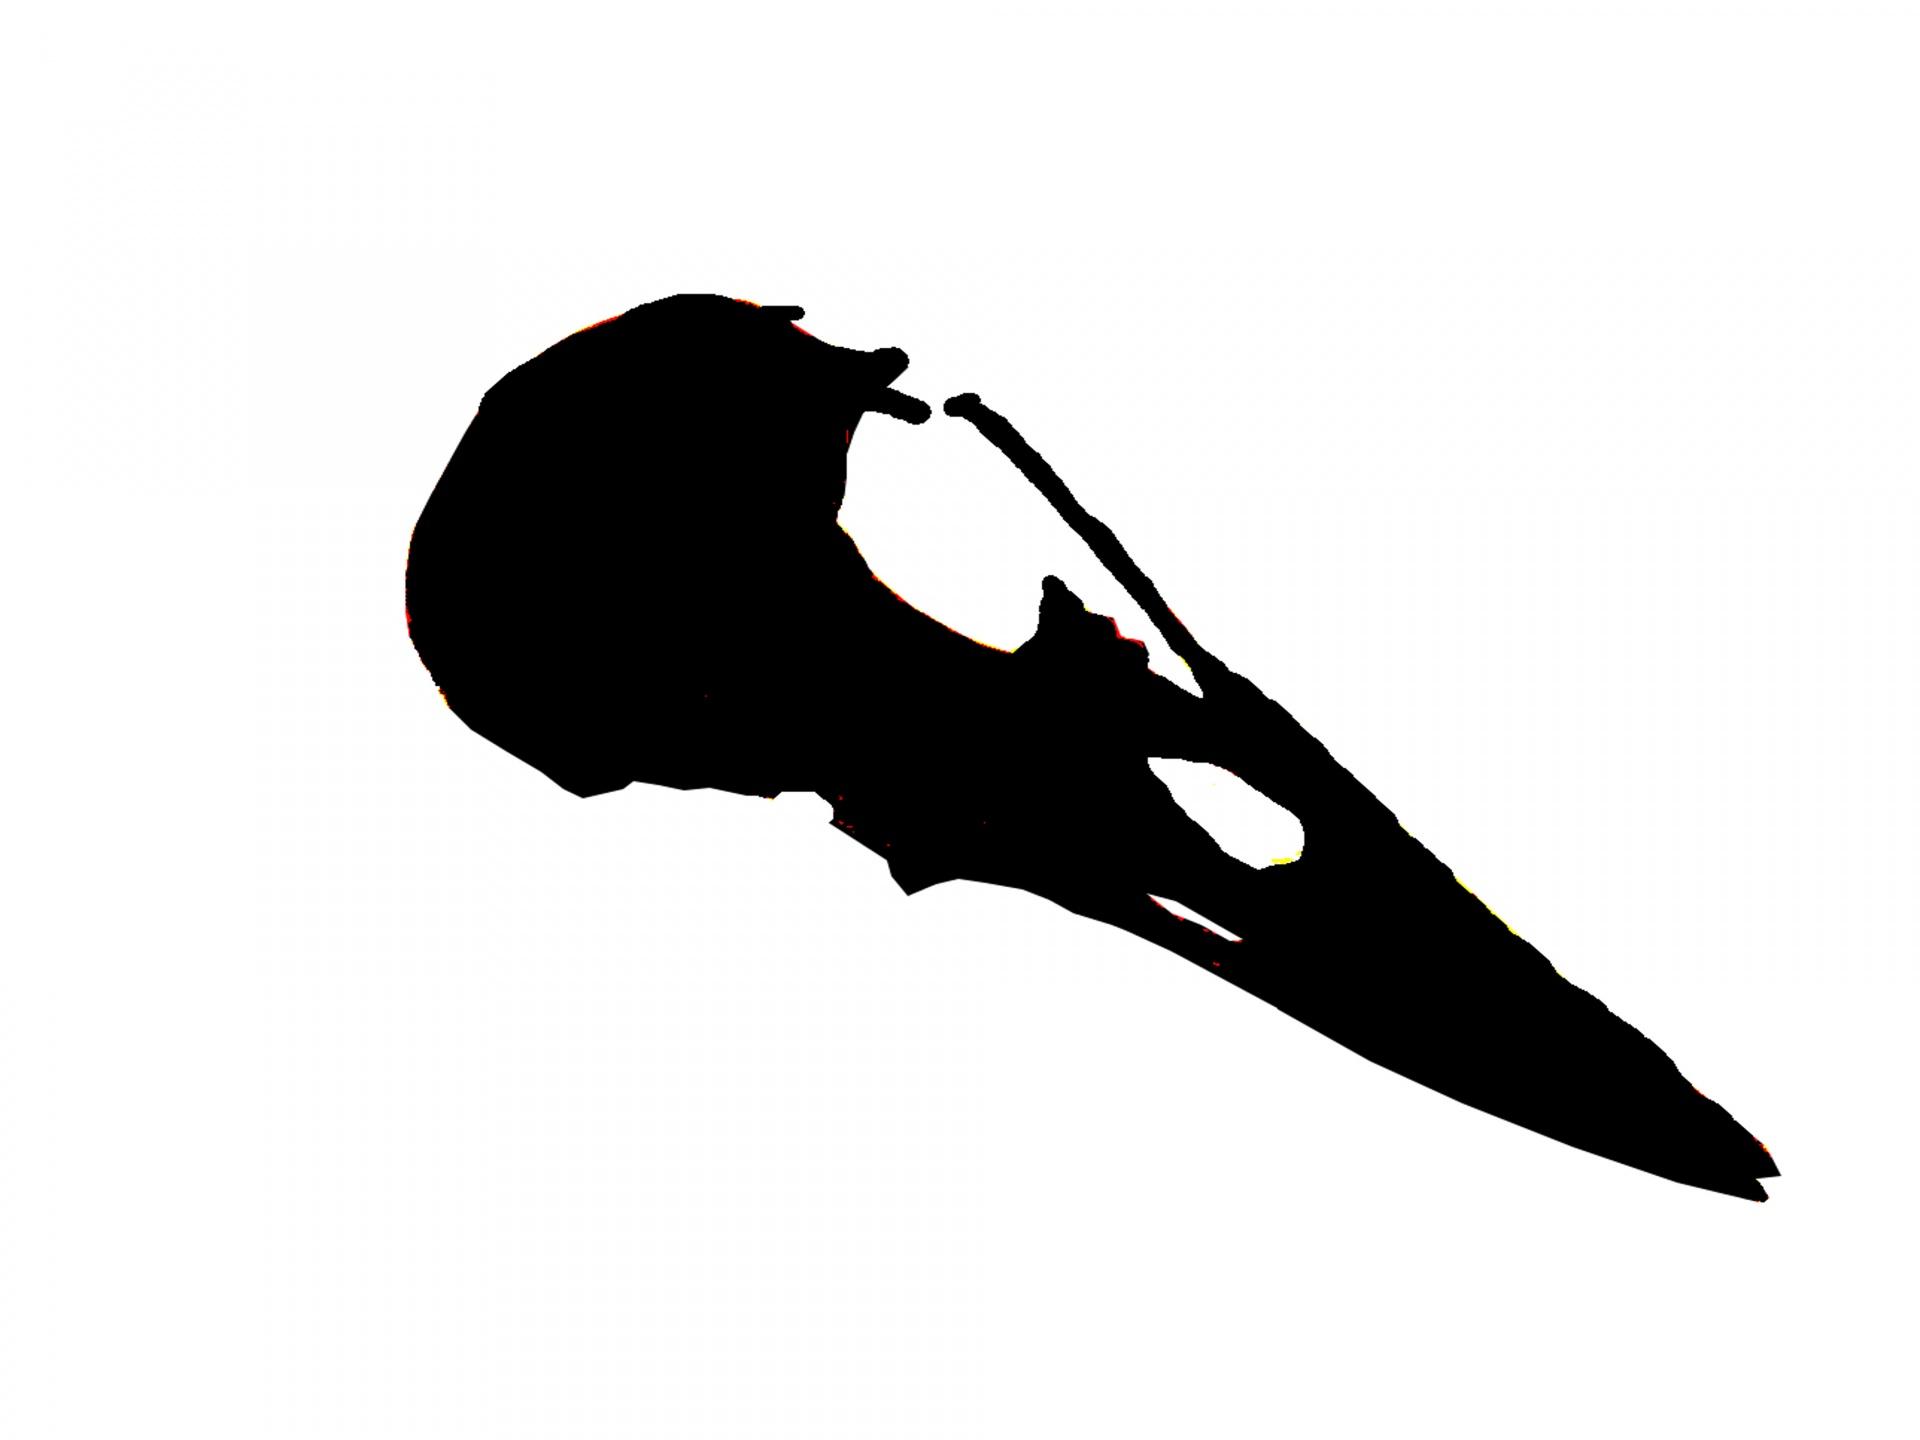 1920x1440 Skull Silhouette Free Stock Photo